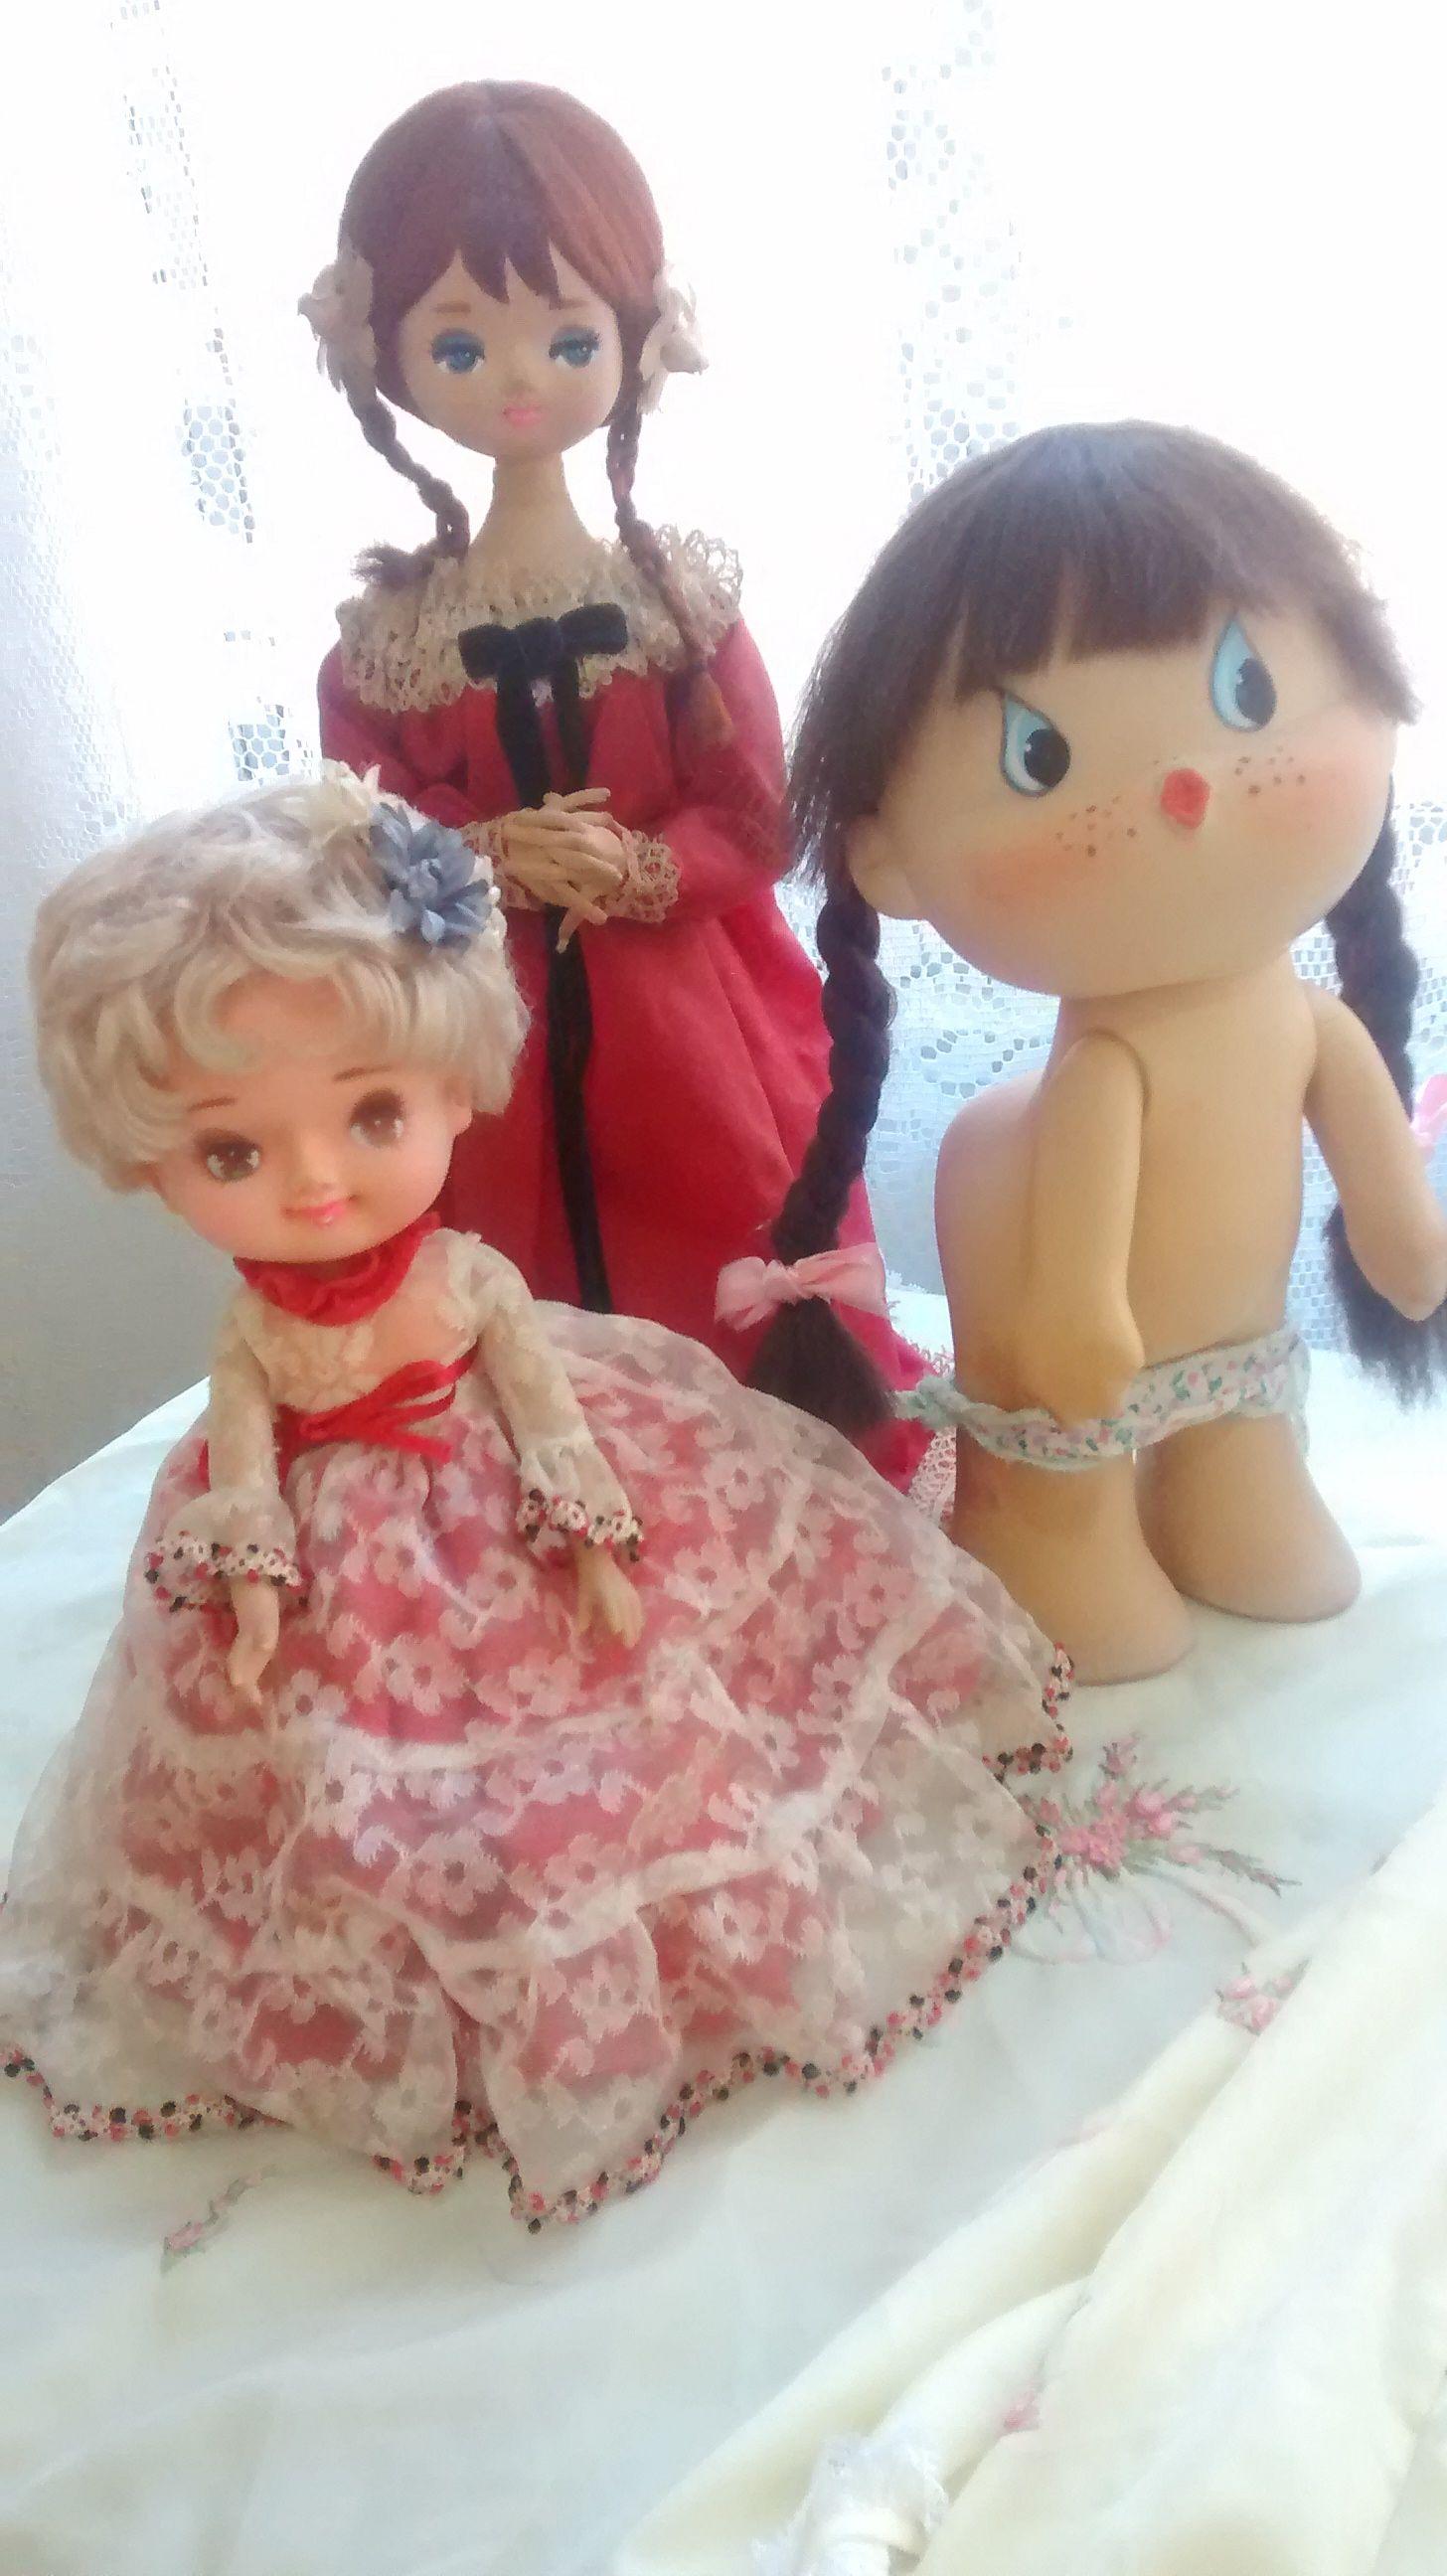 Bonecas antigas Big eyes peladinhas, pose doll japonesas.